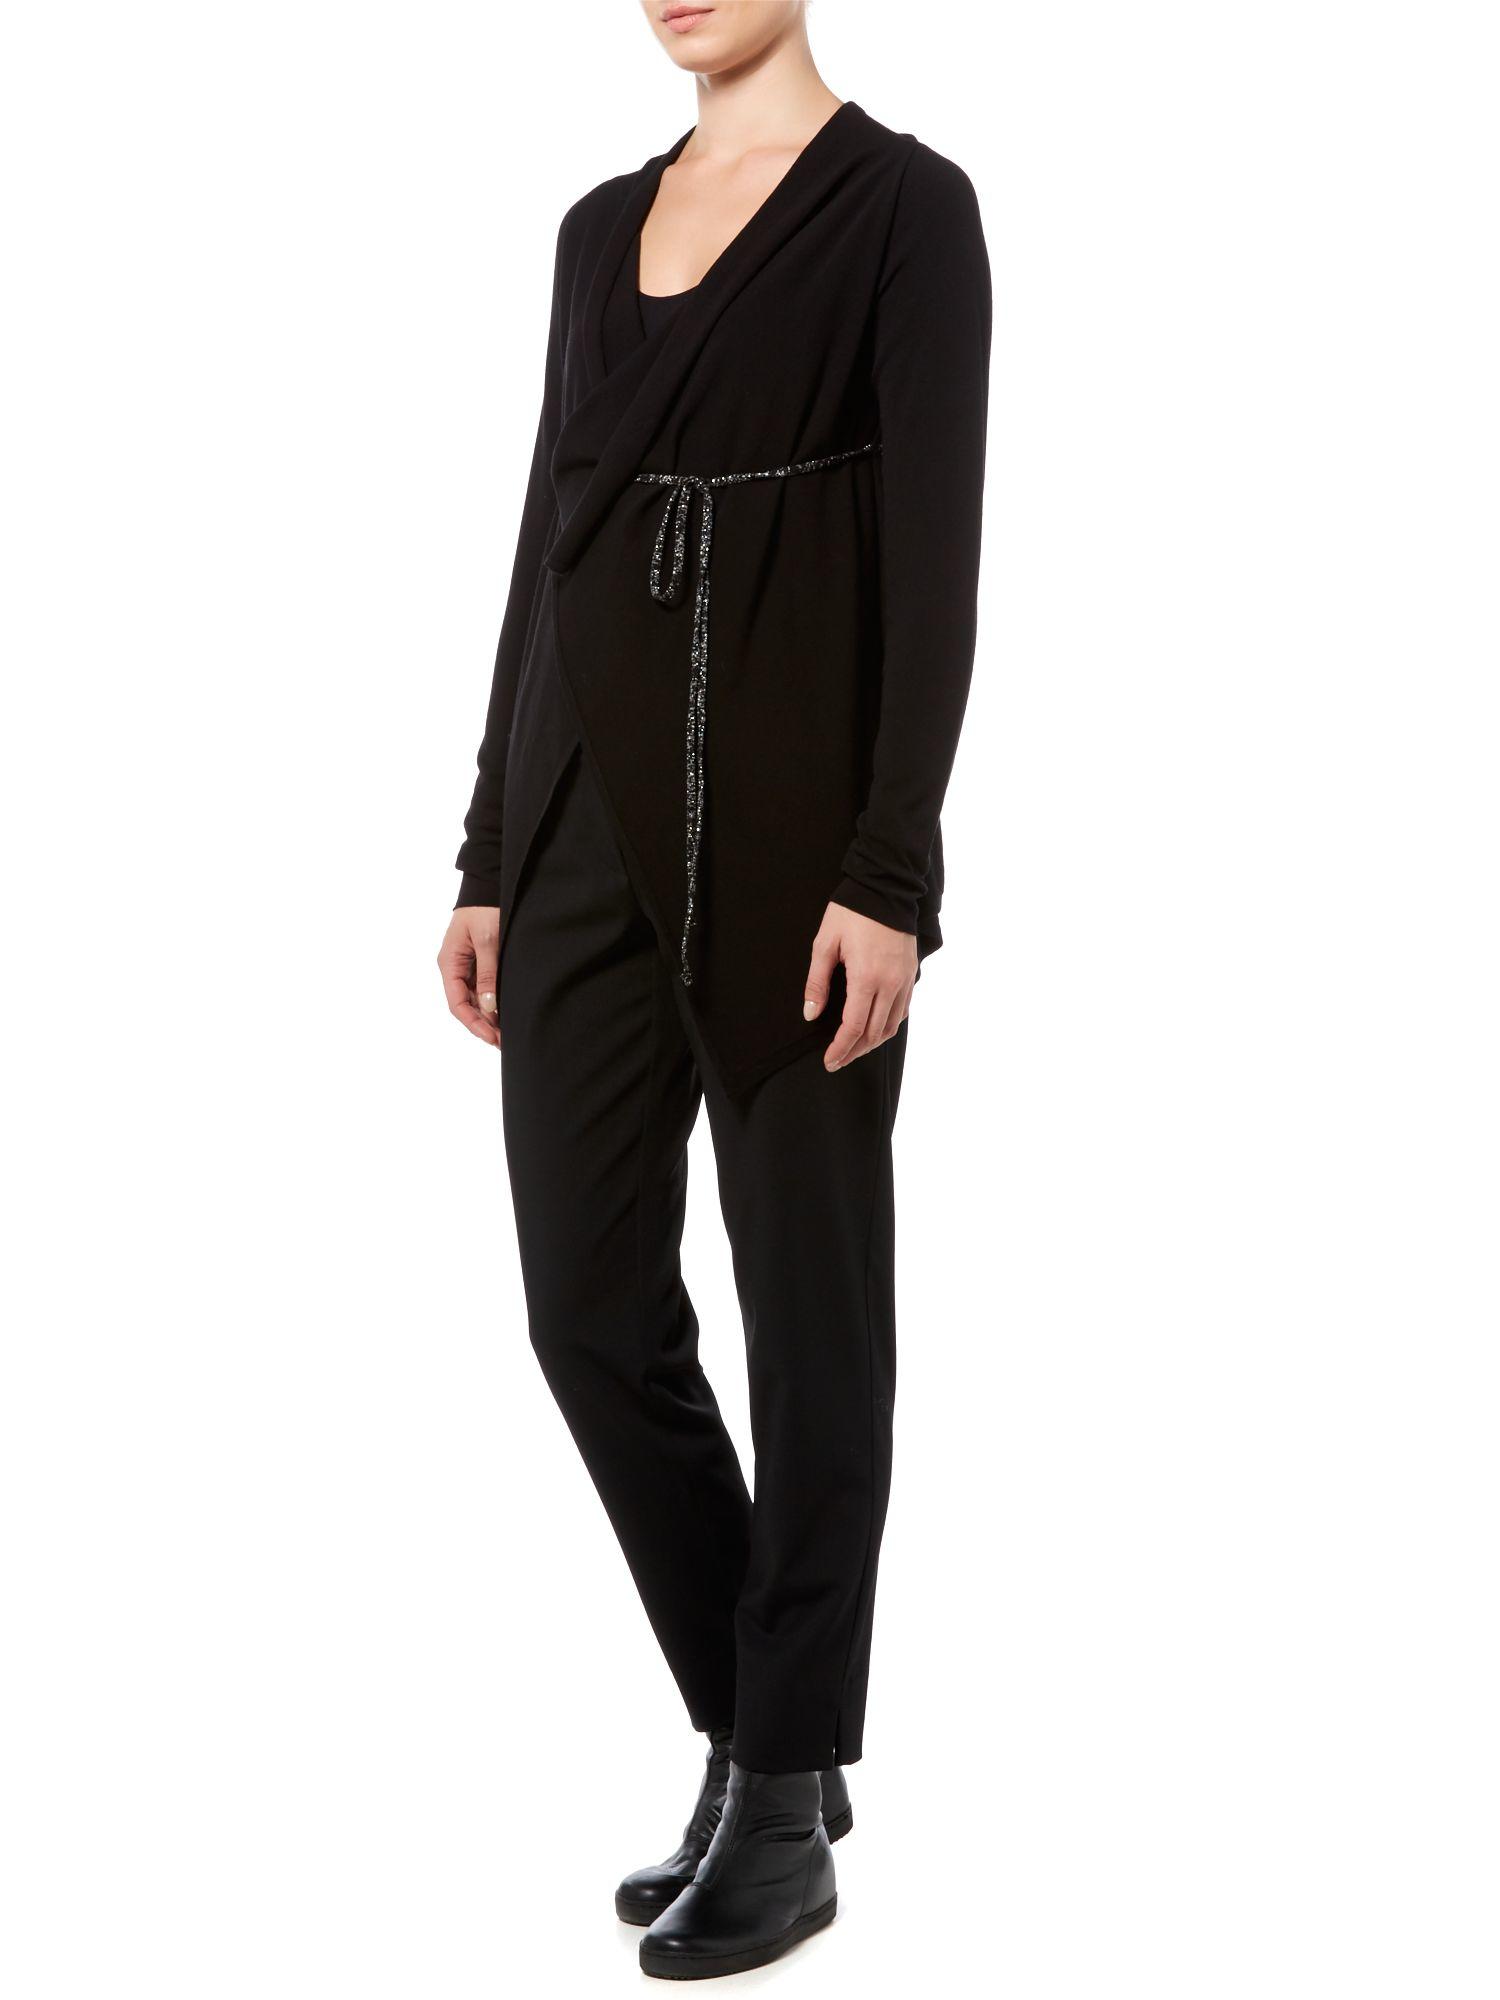 Sarah Pacini Synthetic V Neck Long Cardigan in Black